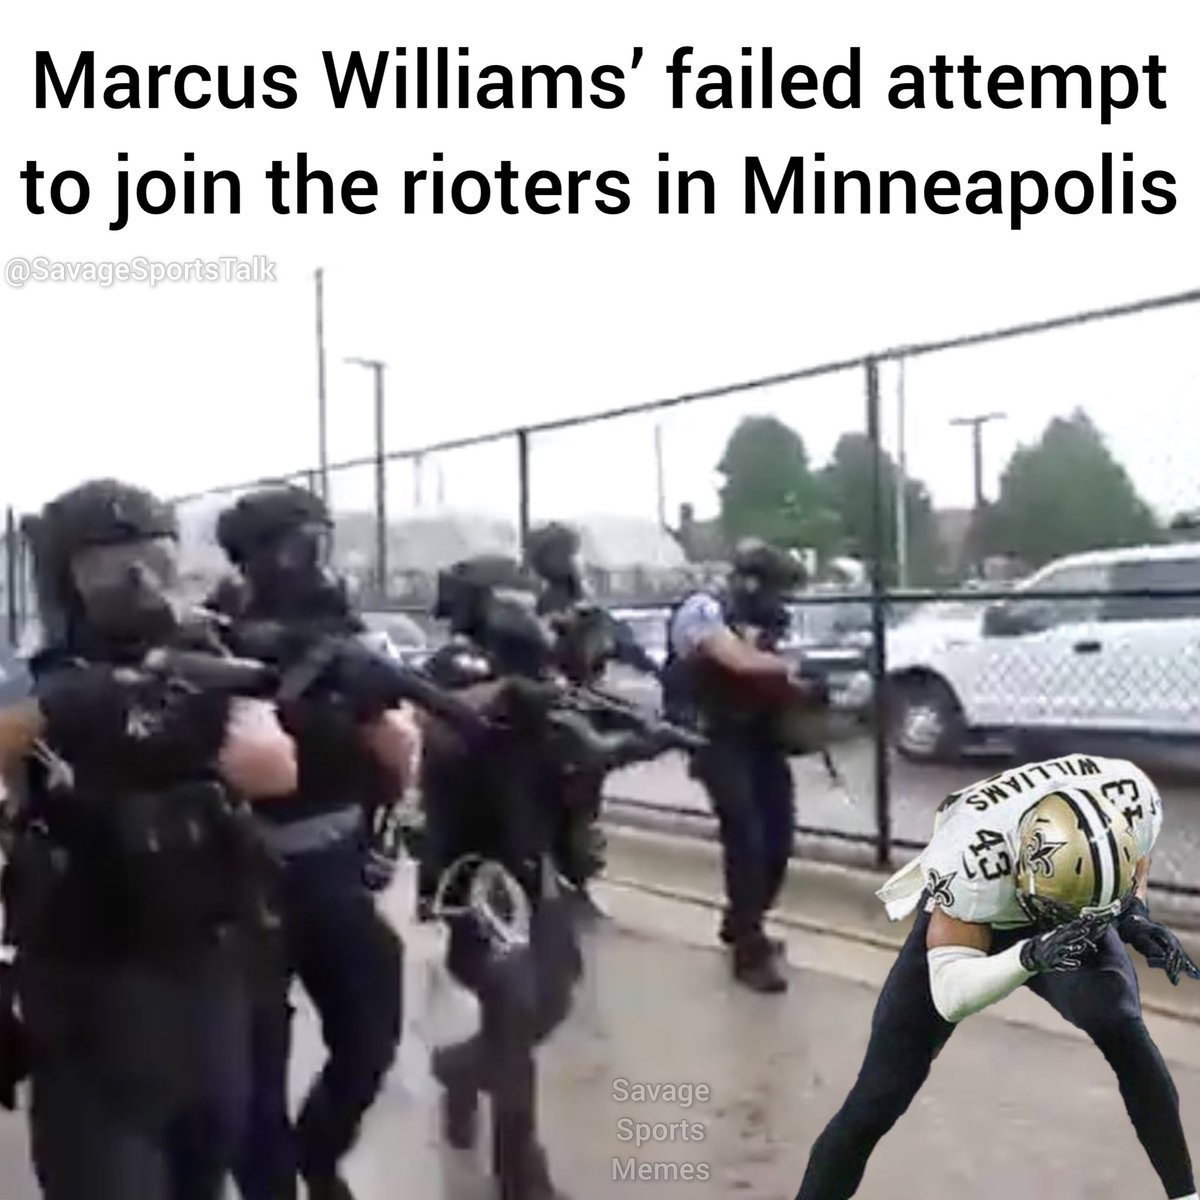 This dude can't succeed at anything in Minnesota. . .   #NFL #NFLmeme #NFLmemes #football #footballmeme #footballmemes #meme #memes #sports #sportsmeme #sportsmemes #minneapolis #minnesota #riots #vikings #minnesotavikings #skol #saints #neworleans #neworleanssaints #whodatpic.twitter.com/n5hTI3BWBR